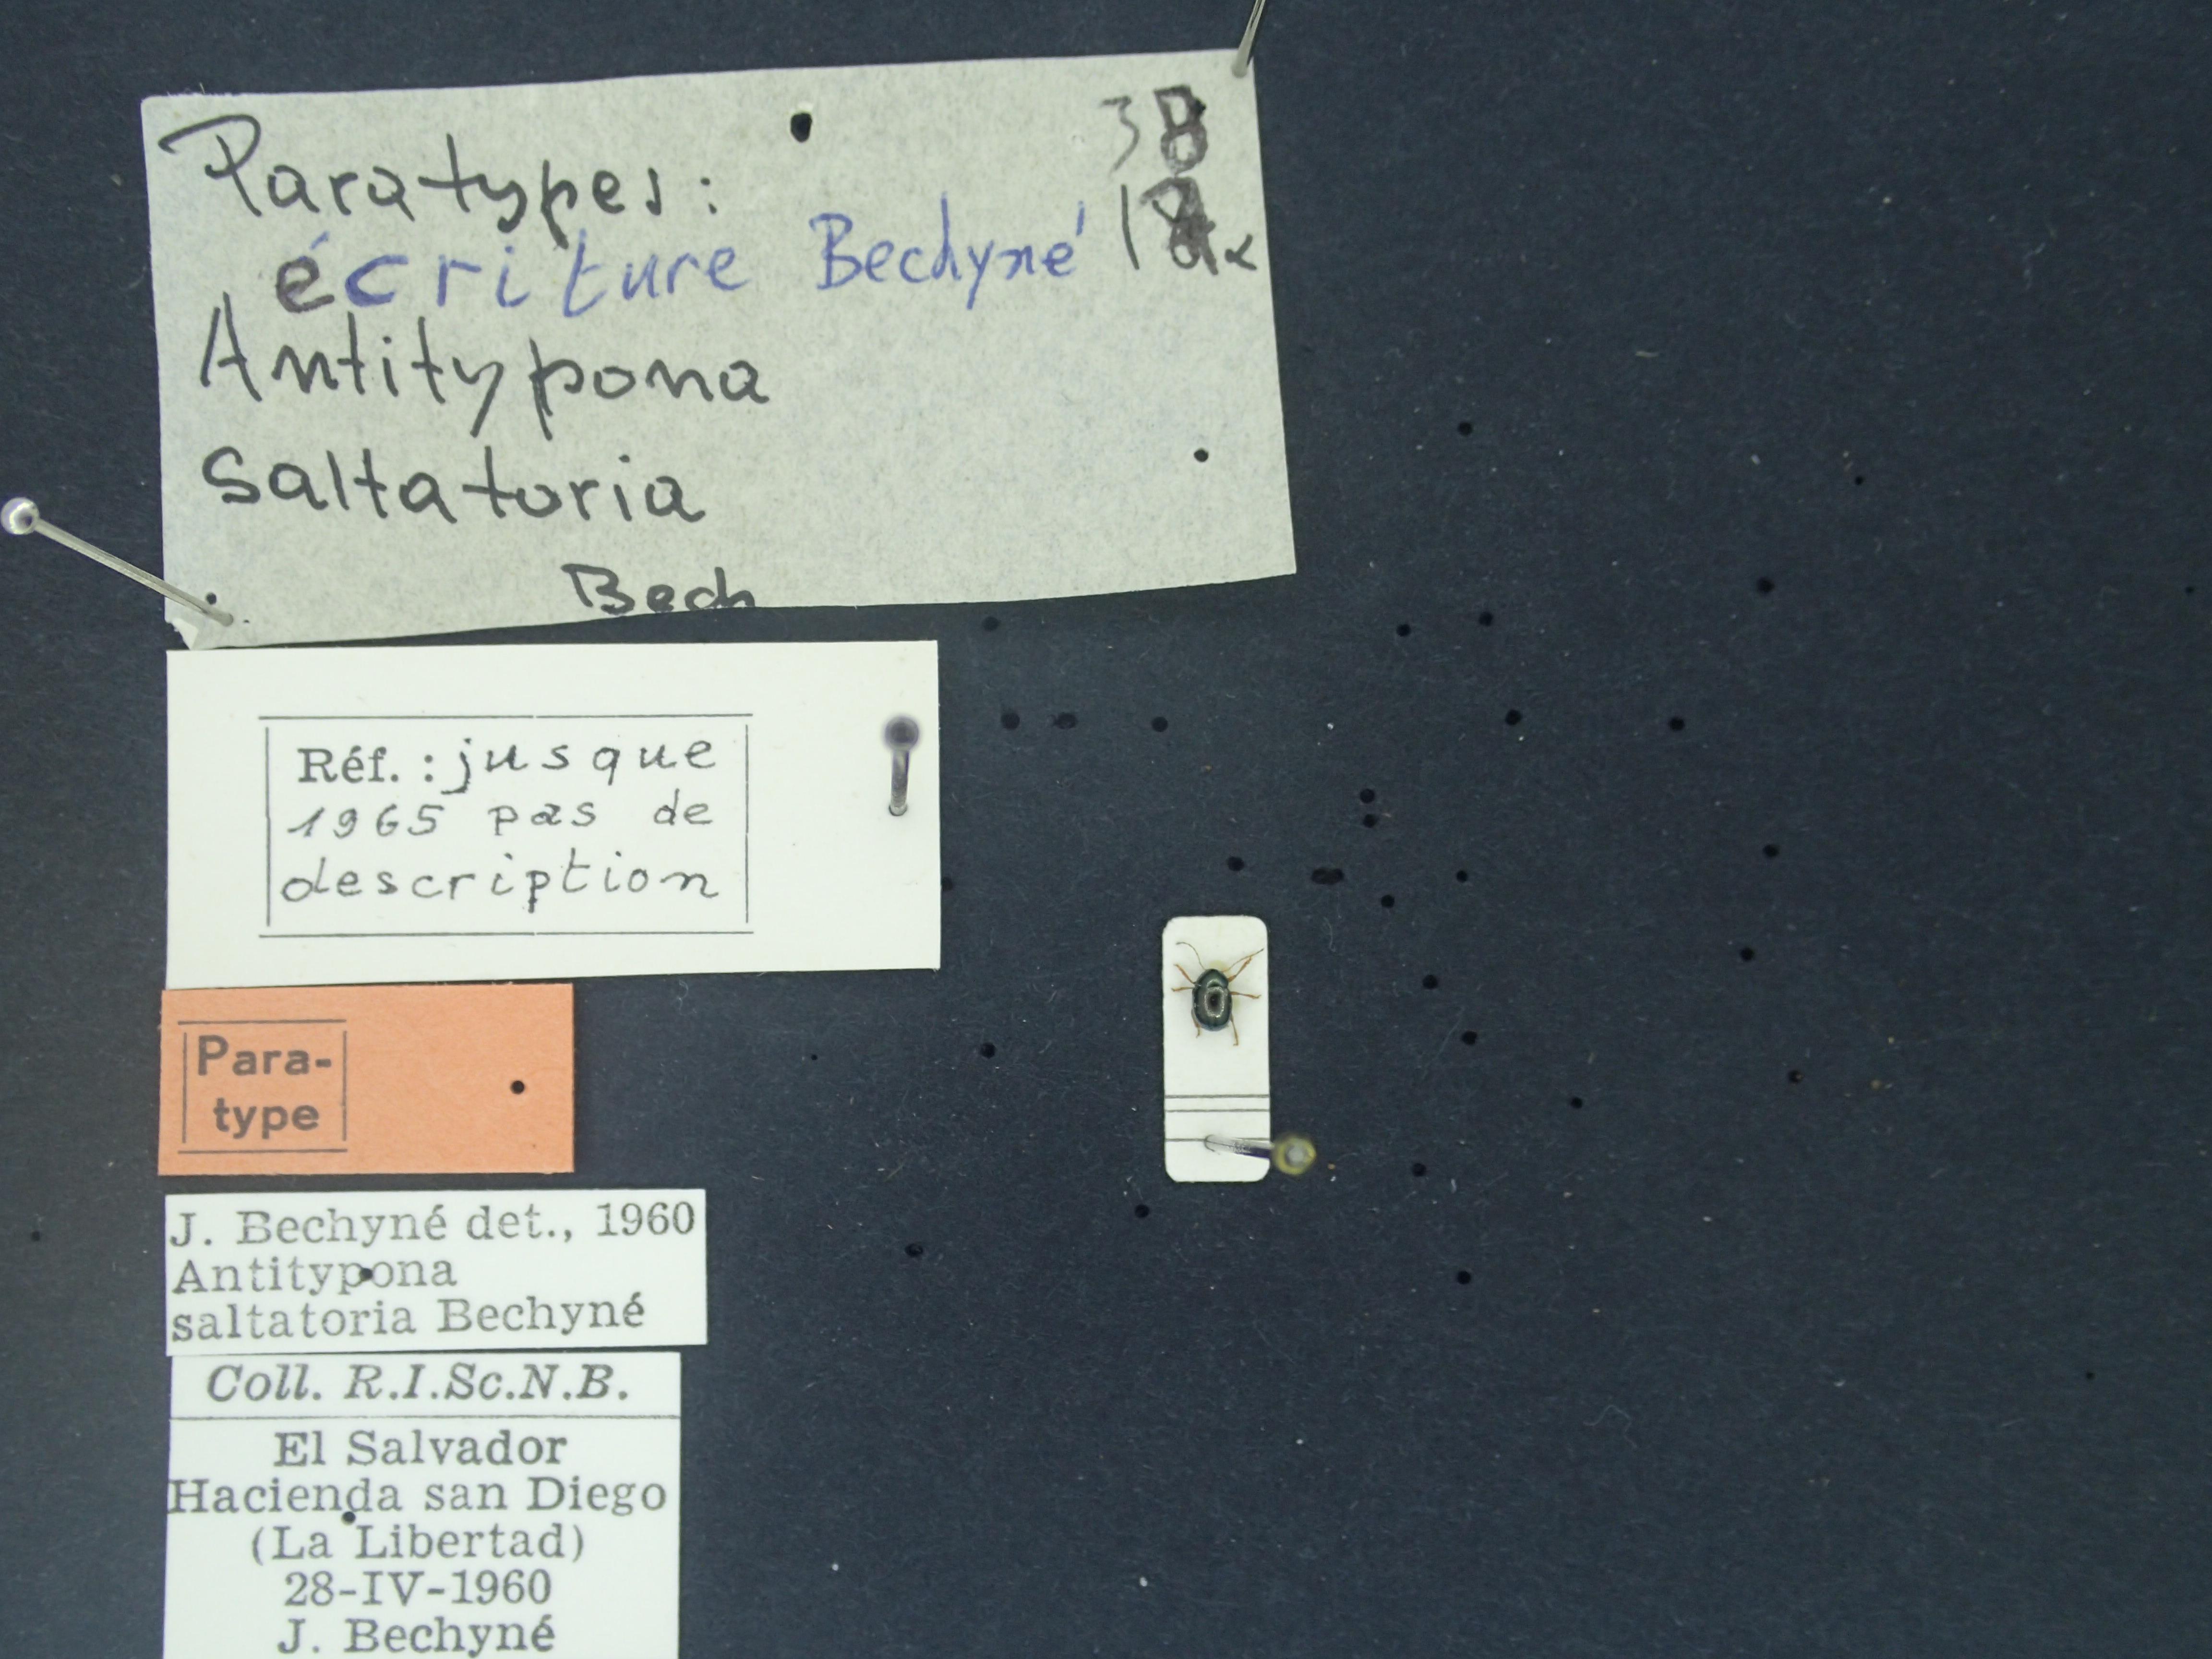 BE-RBINS-ENT Antitypona saltatoria K30_D01_051 Label.JPG